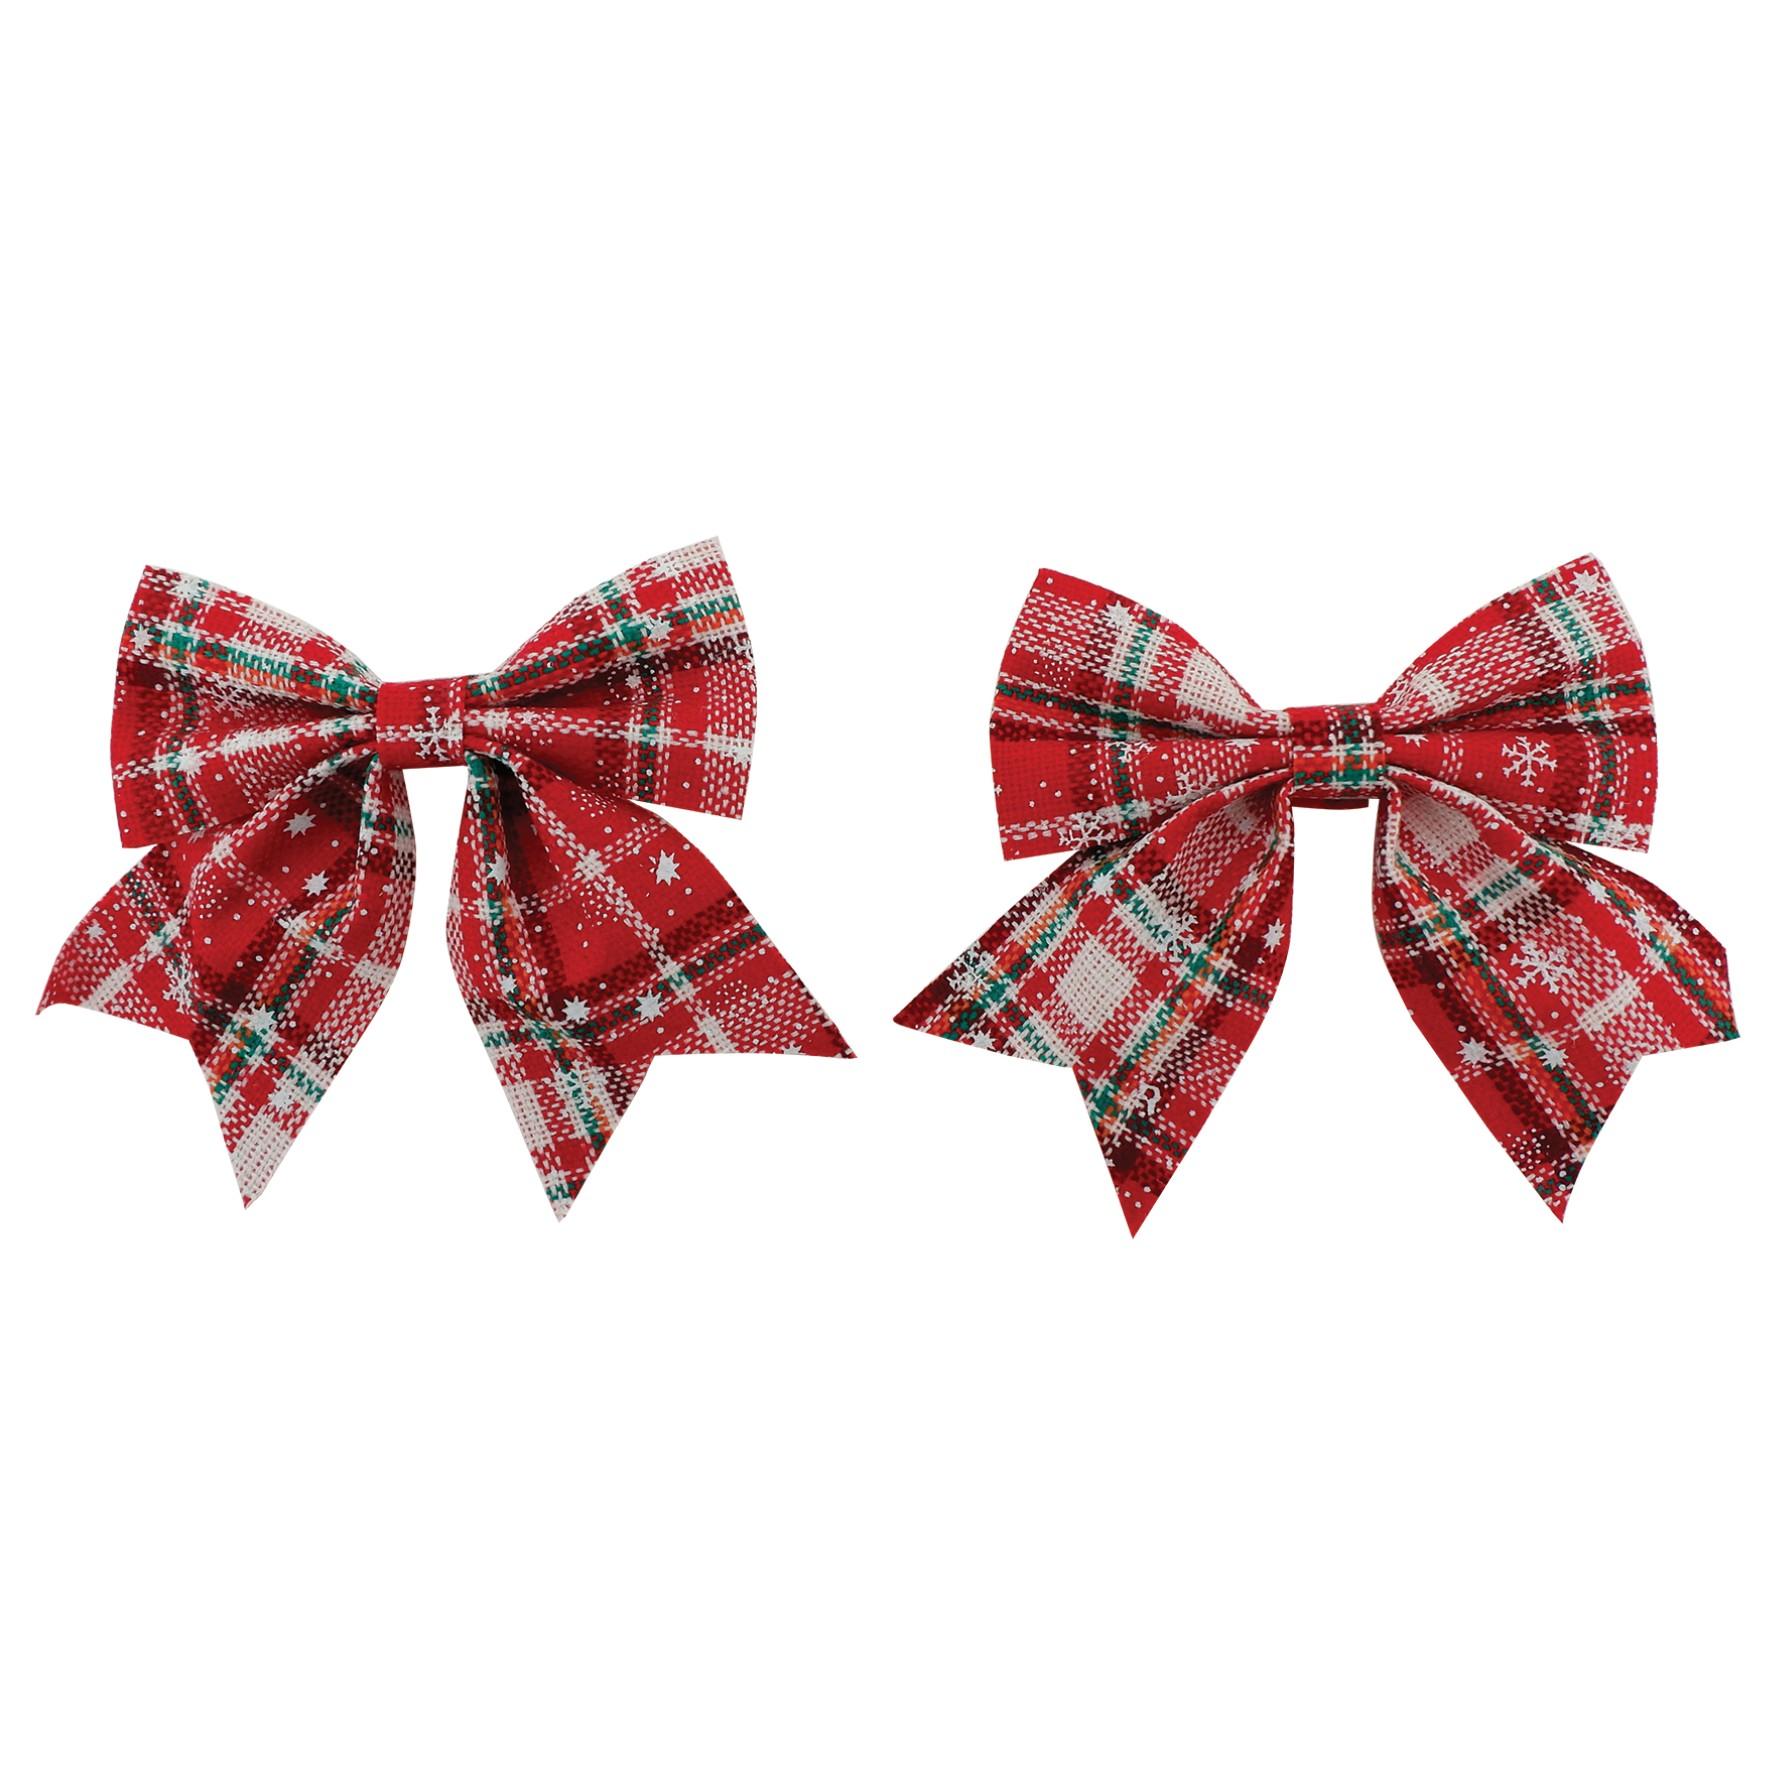 Laco de Natal 13cm Xadrez Vermelho 2 Pecas - Magizi